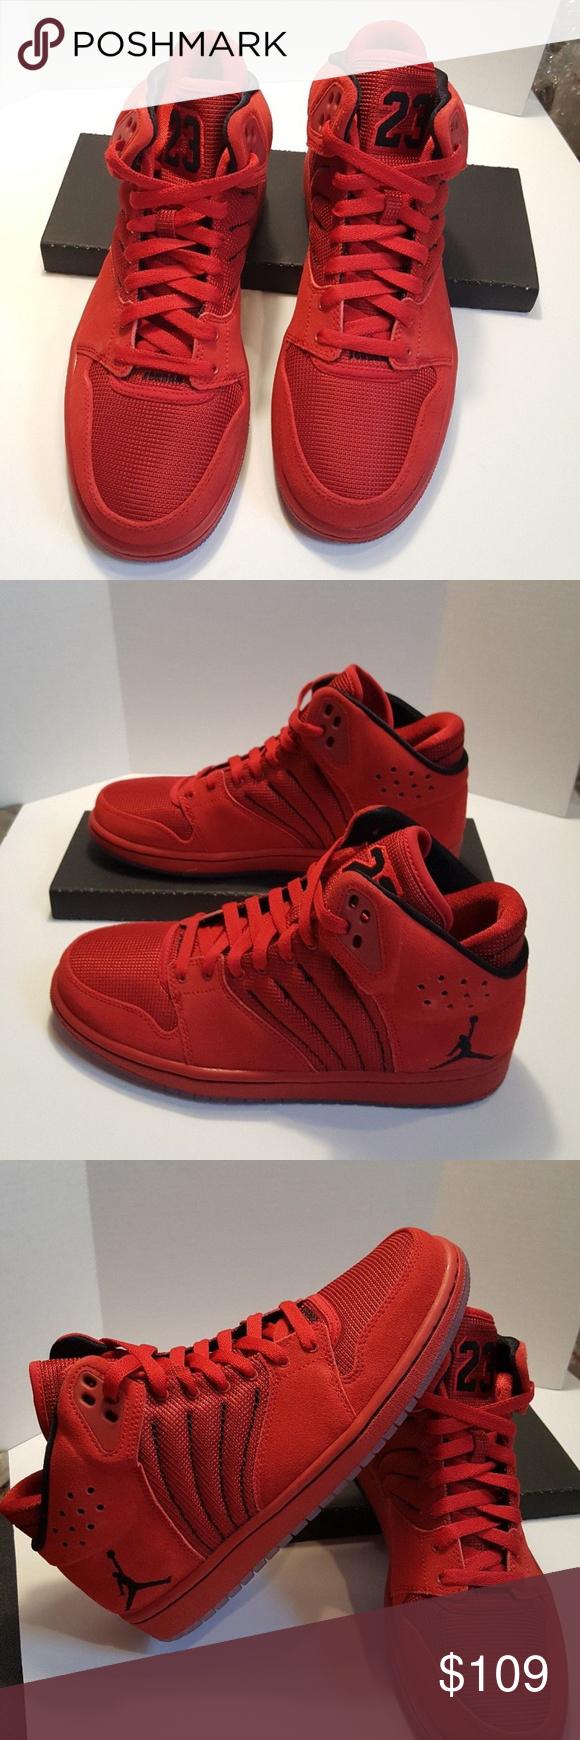 new arrival f485c 4ab7a Athletic Shoes · Environment · Man Shop · NIKE JORDAN 1 FLIGHT 838818 600 Sz  10.5 ITEM  NIKE JORDAN FLIGHT 1 4 PREMIUM